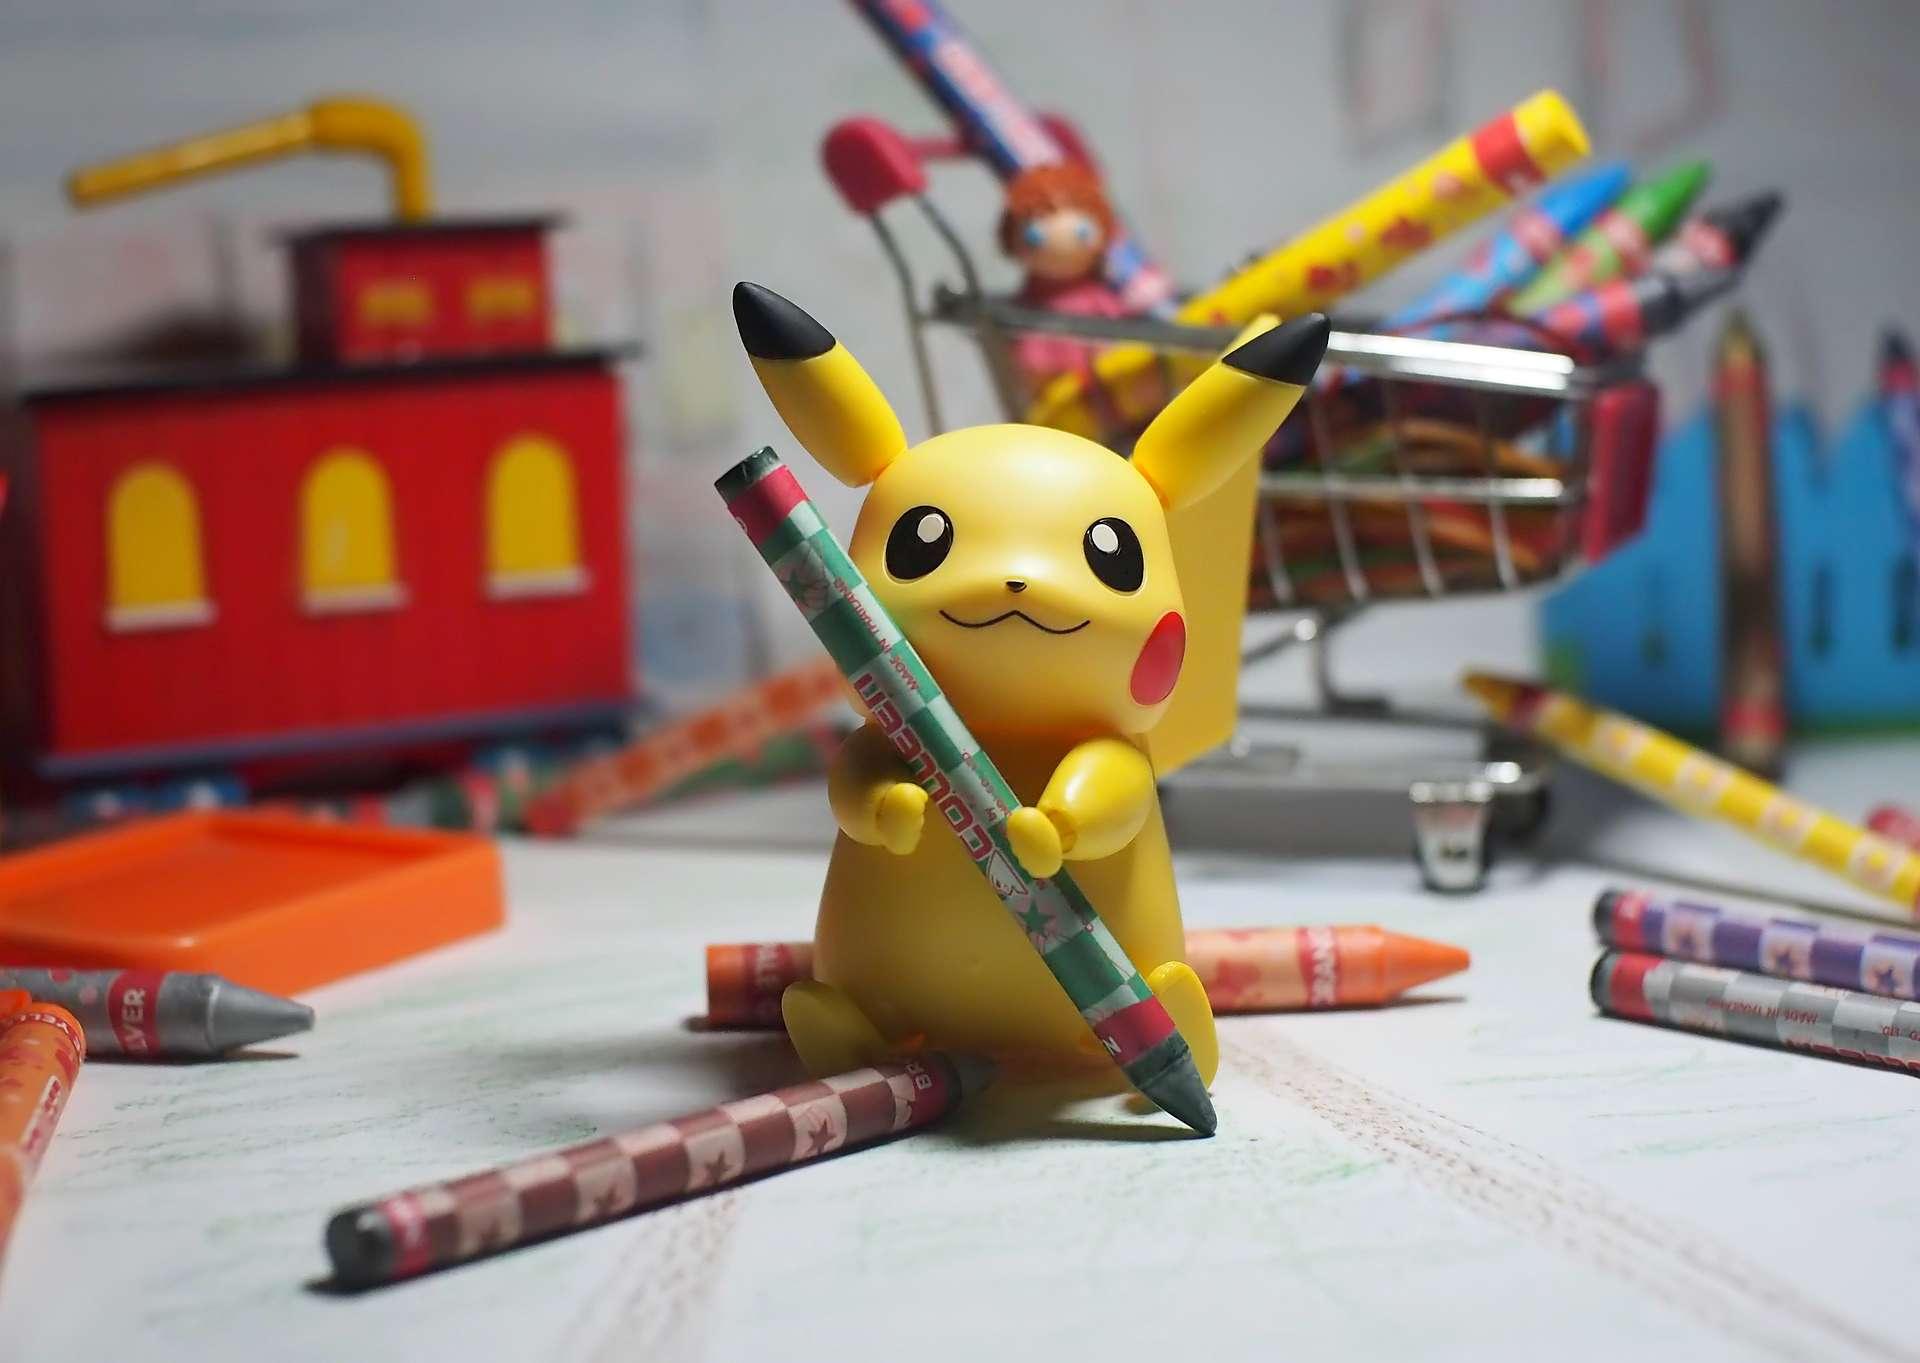 Pikachu Pokemon character holding crayons.